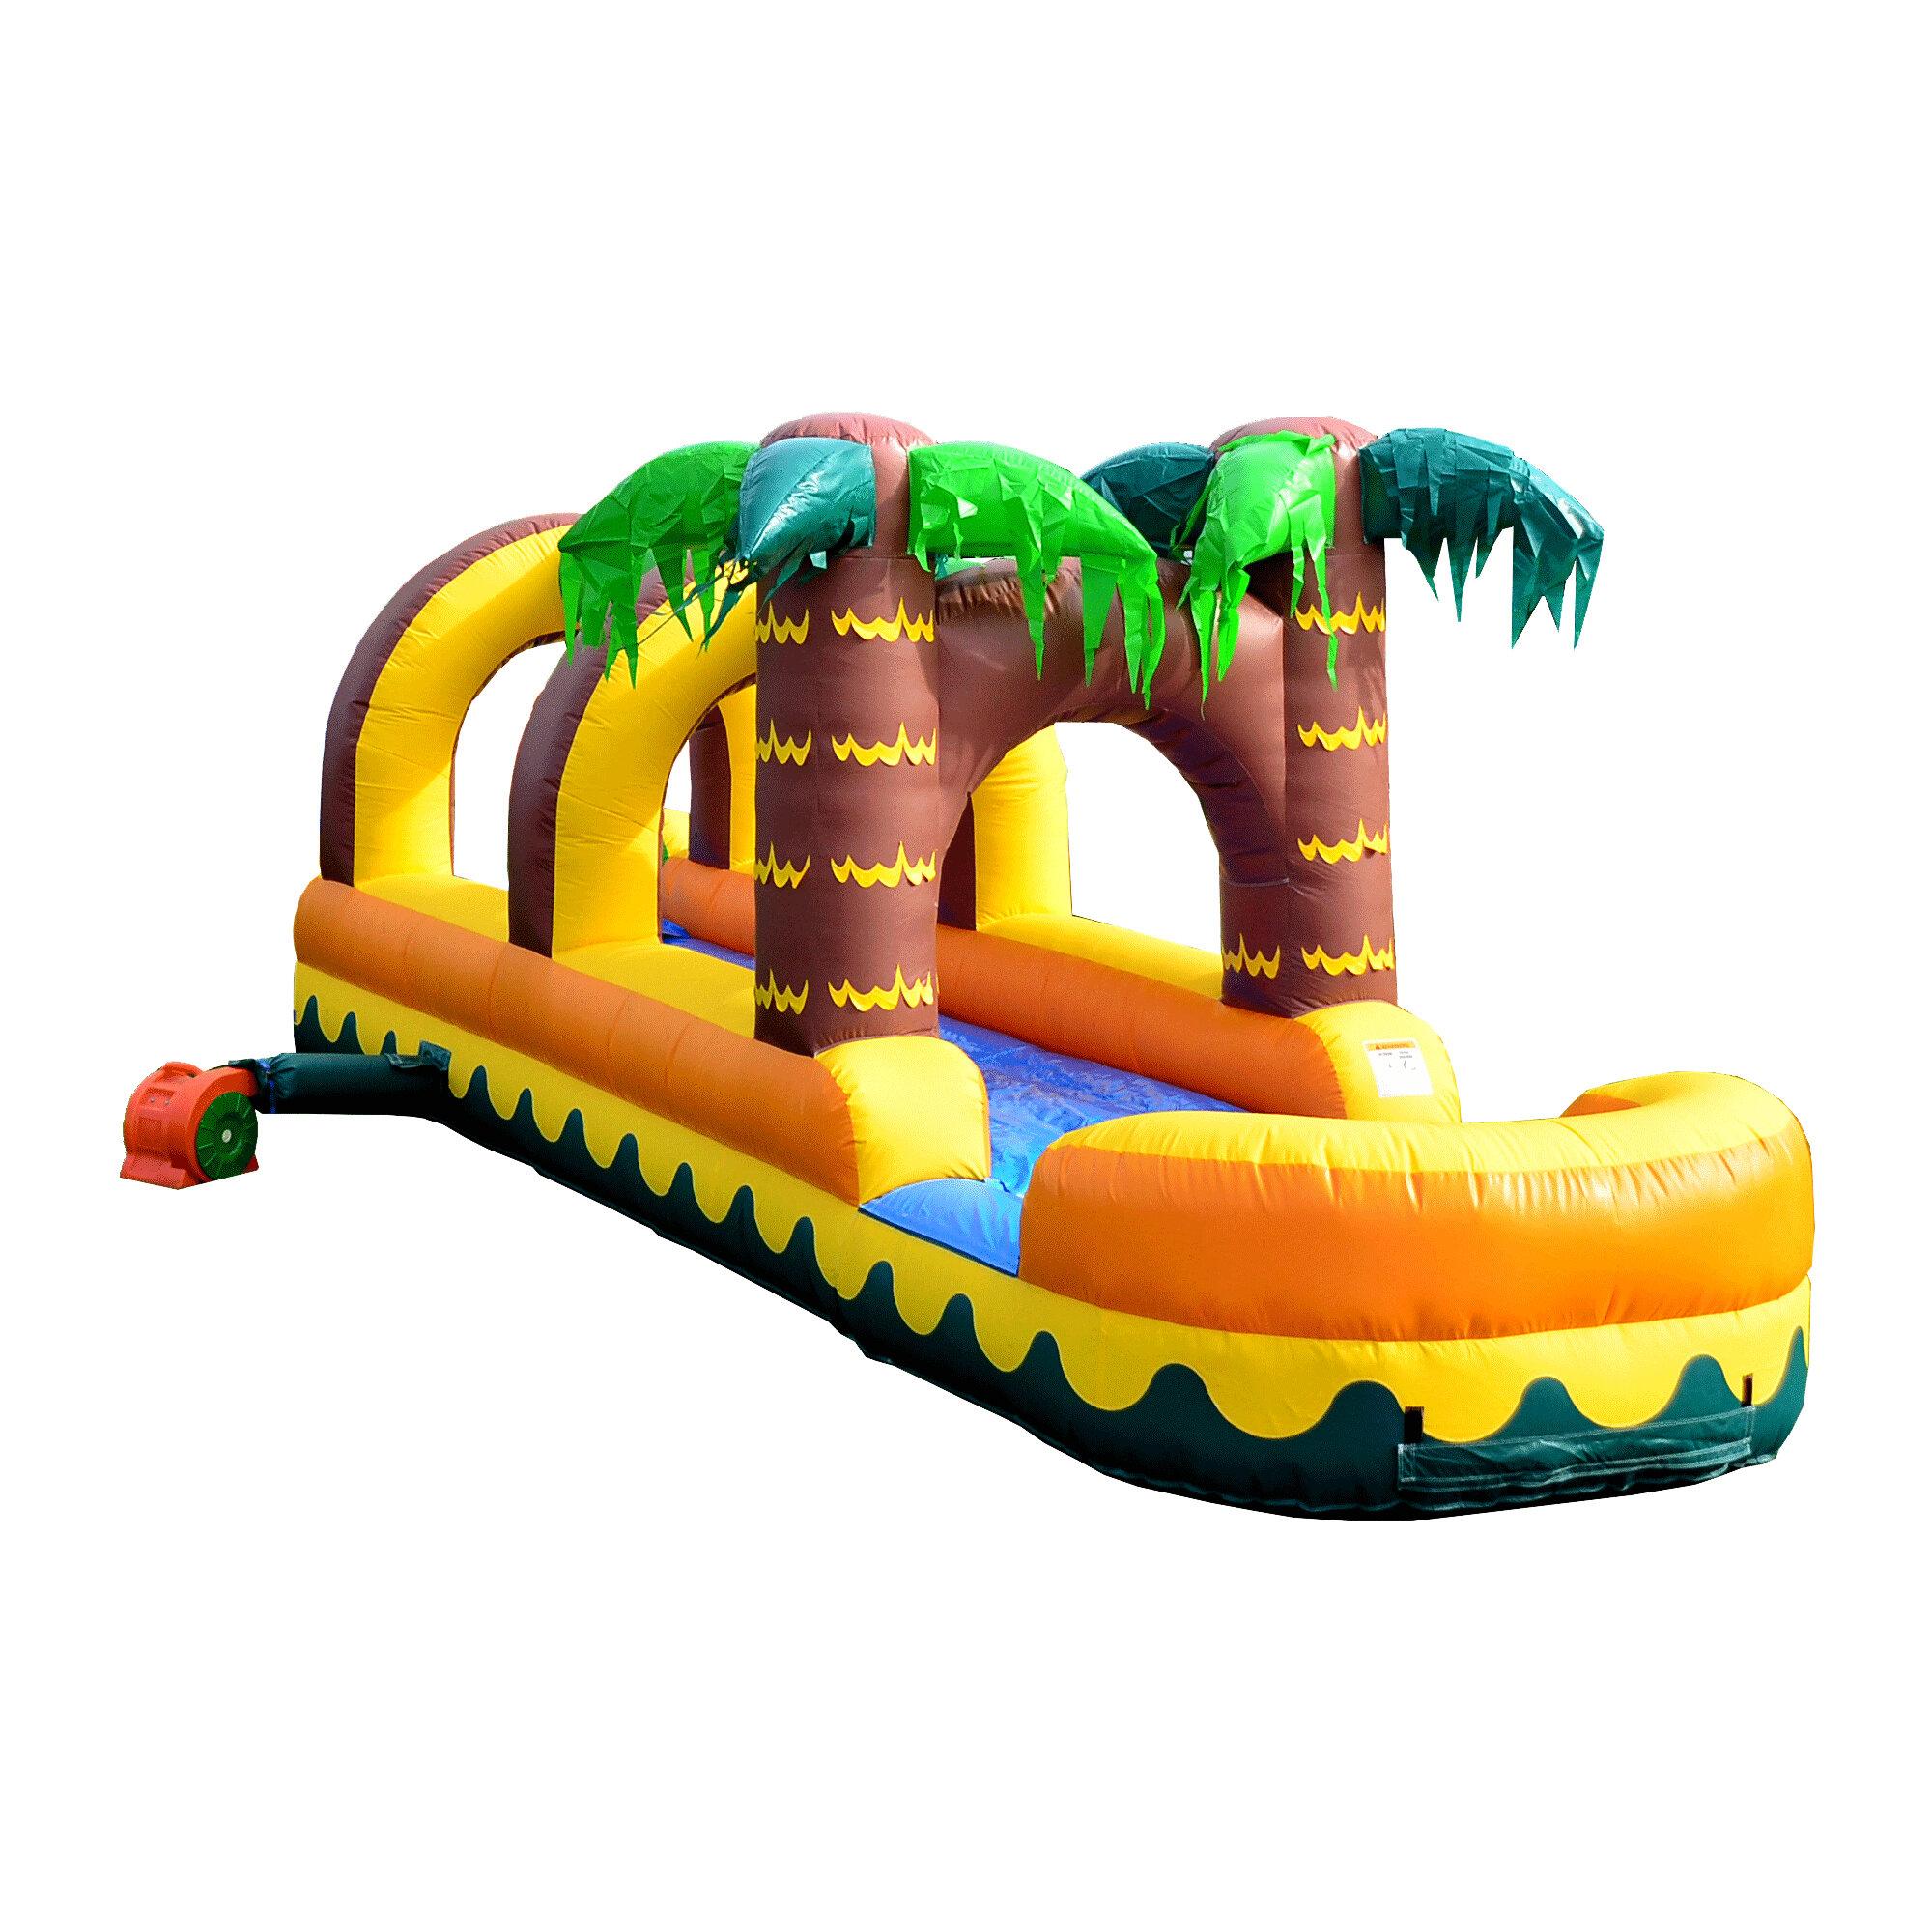 39aaf9e71 JumpOrange Aloha Tropical Inflatable Slip N Slide Bounce House